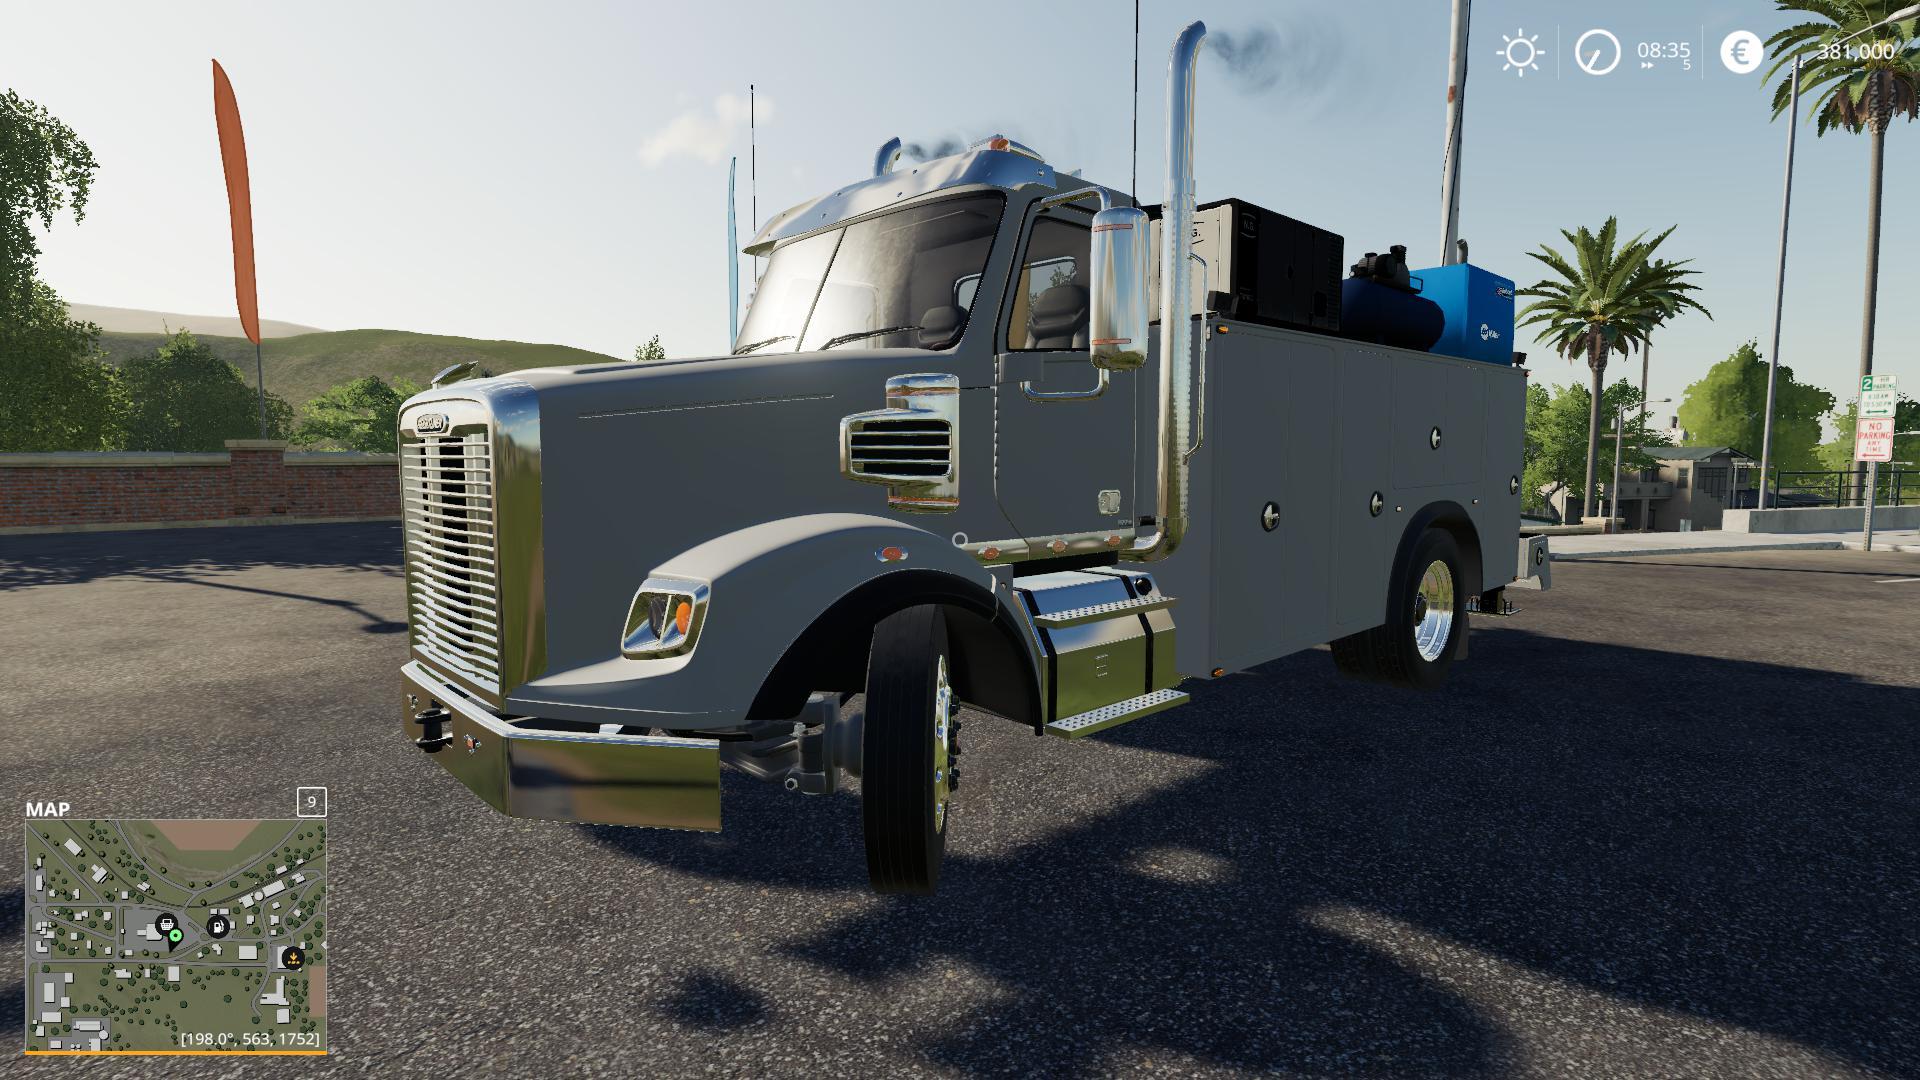 Freightliner Service Truck v 1.0   FS19 mods, Farming ...Kenworth Dump Trucks Fs19